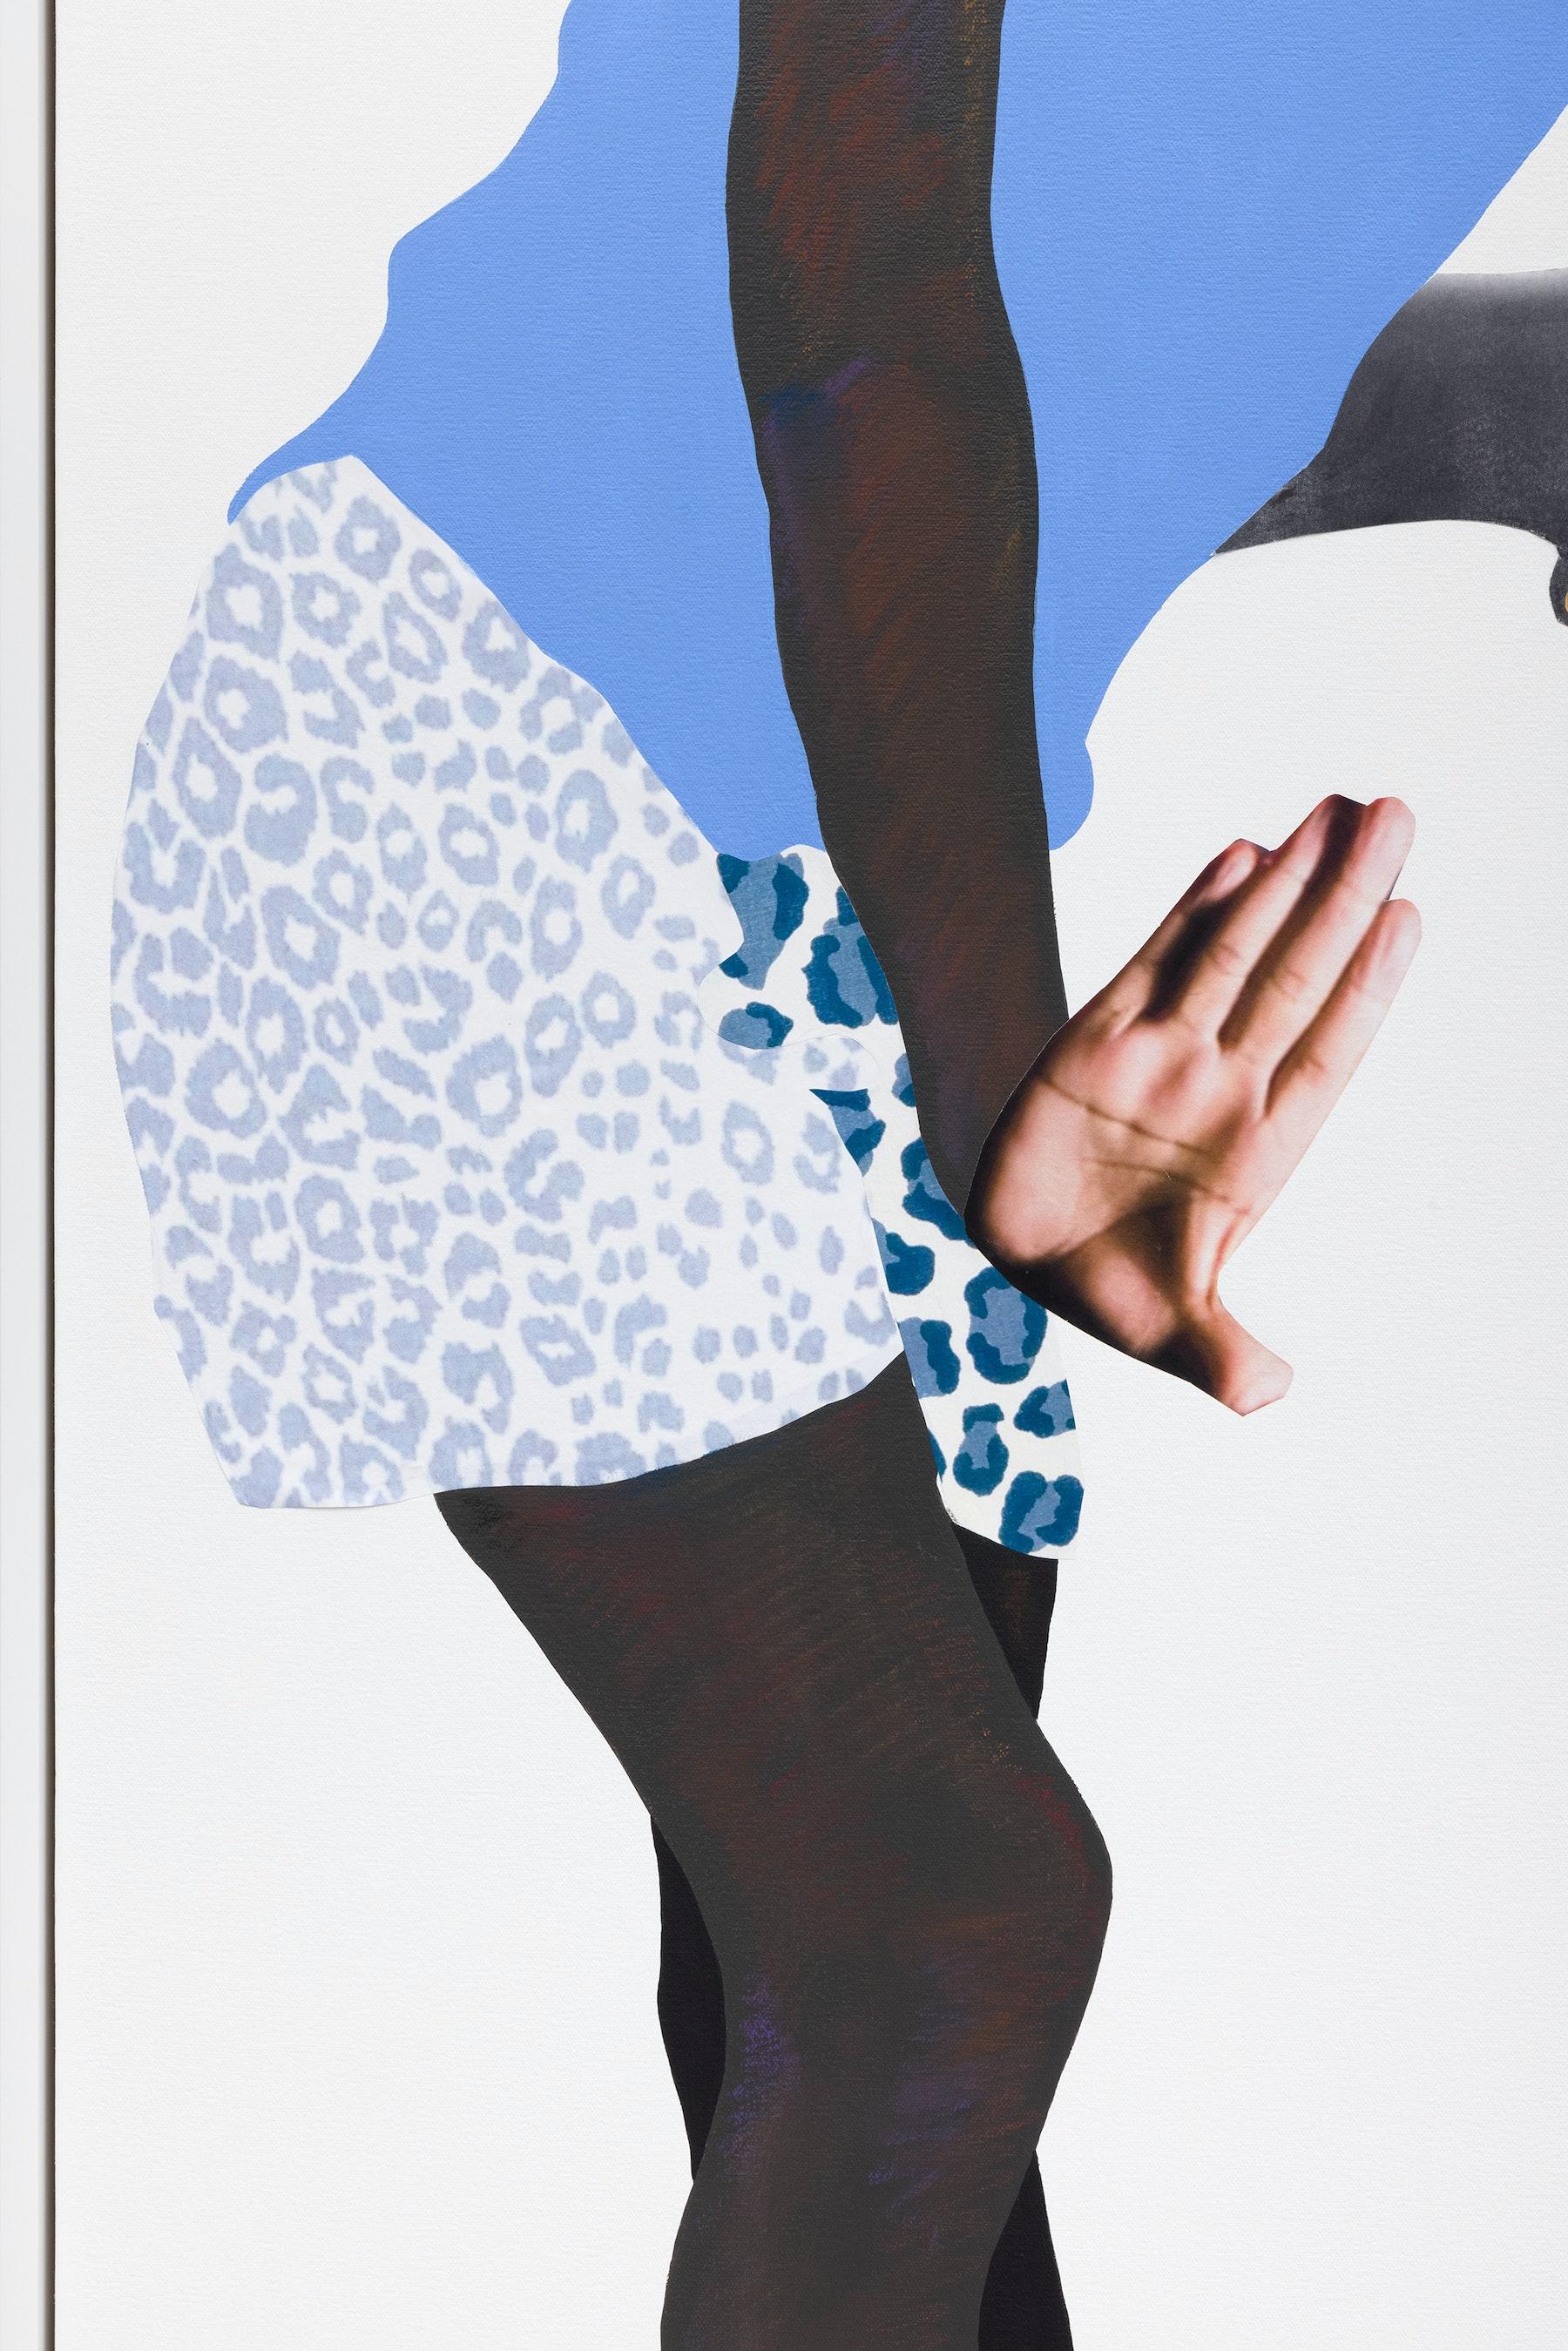 "Deborah Roberts ""Building hope,"" 2021 Mixed media collage on canvas 70"" x 70"" [HxW] (177.8 x 177.8 cm); 71 ¹⁄₂"" x 71 ¹⁄₂"" x 2 ¹⁄₄"" [HxWxD] (181.61 x 181.61 x 5.71 cm) framed Inventory #ROB451 Courtesy of the artist and Vielmetter Los Angeles Photo credit: Jeff McLane"